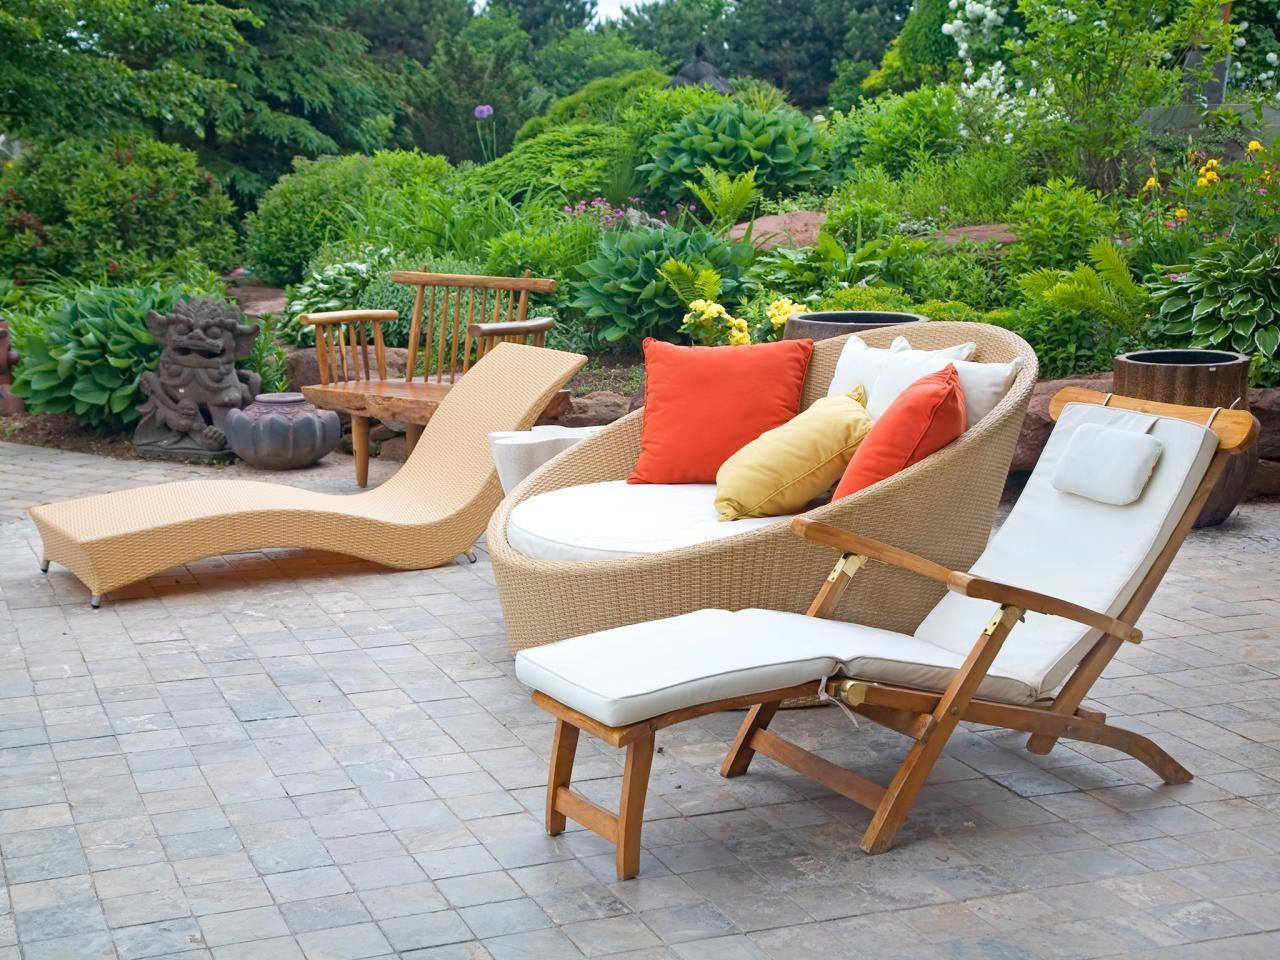 Garden Furniture Design Ideas Modern outdoor furniture patio furniture ideas furniture ideas modern outdoor furniture workwithnaturefo